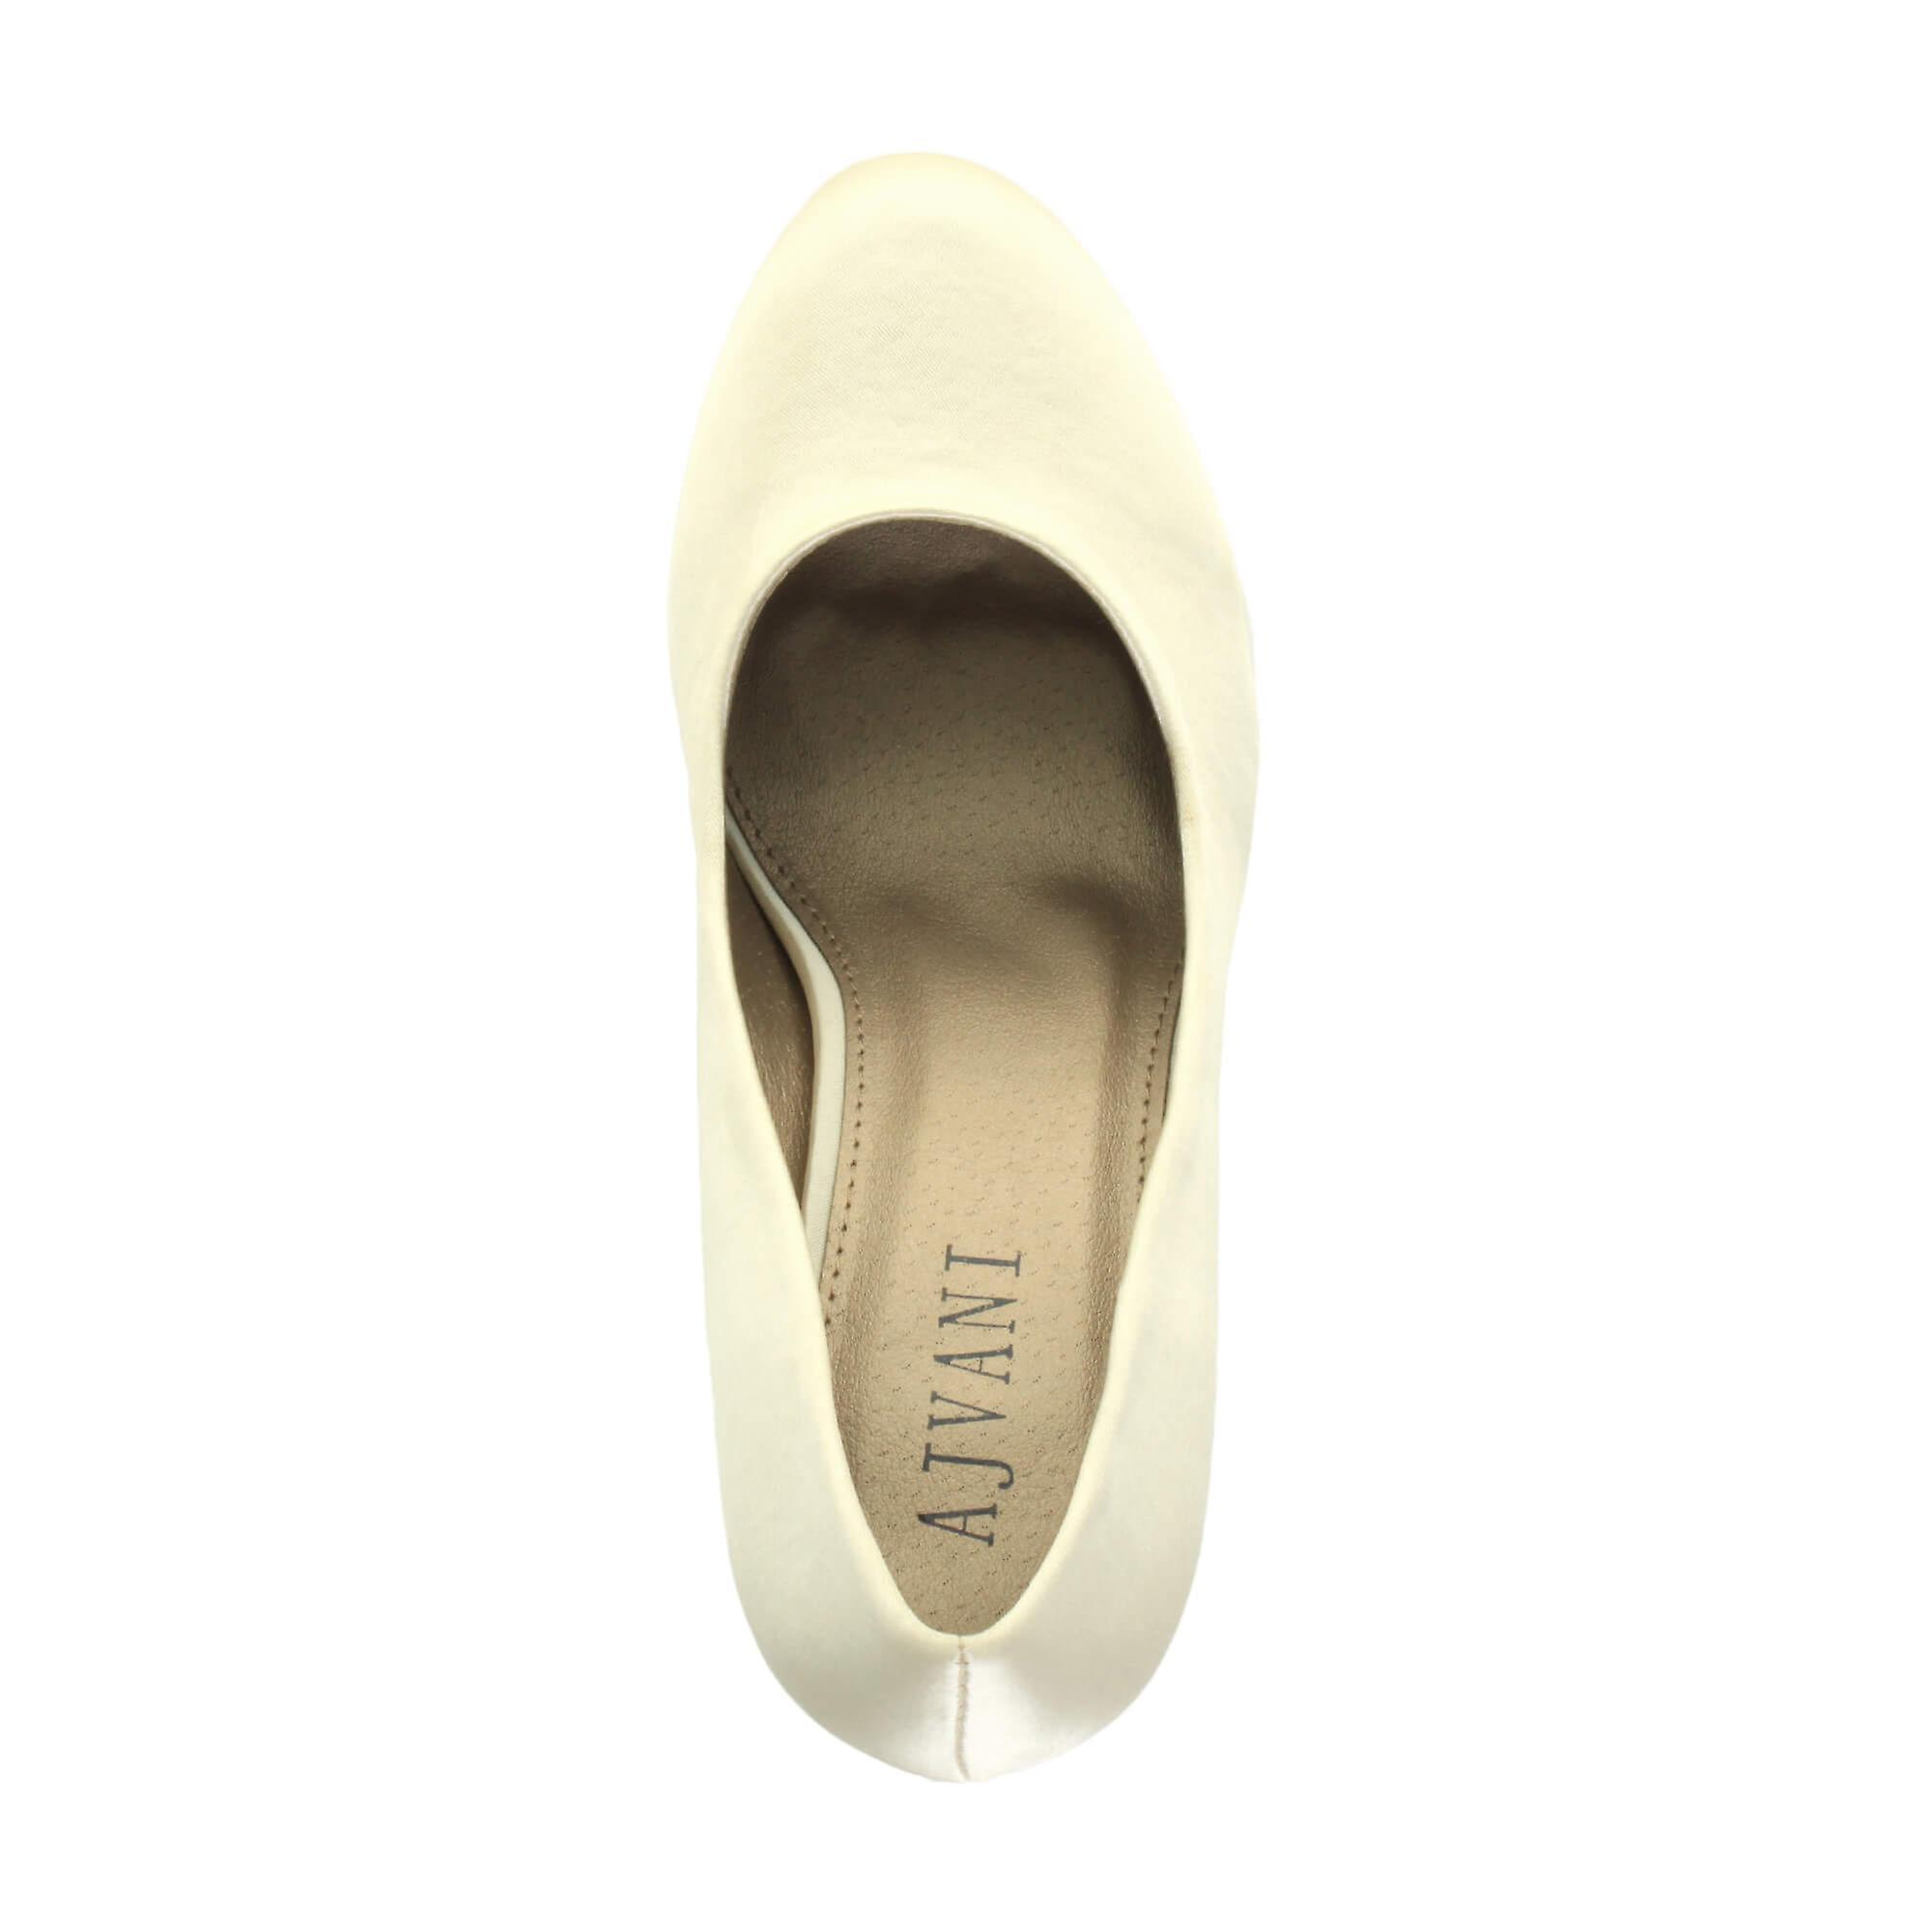 Ajvani womens mid high heel platform party work evening court party prom wedding bridal court evening shoes pumps 5b61b9